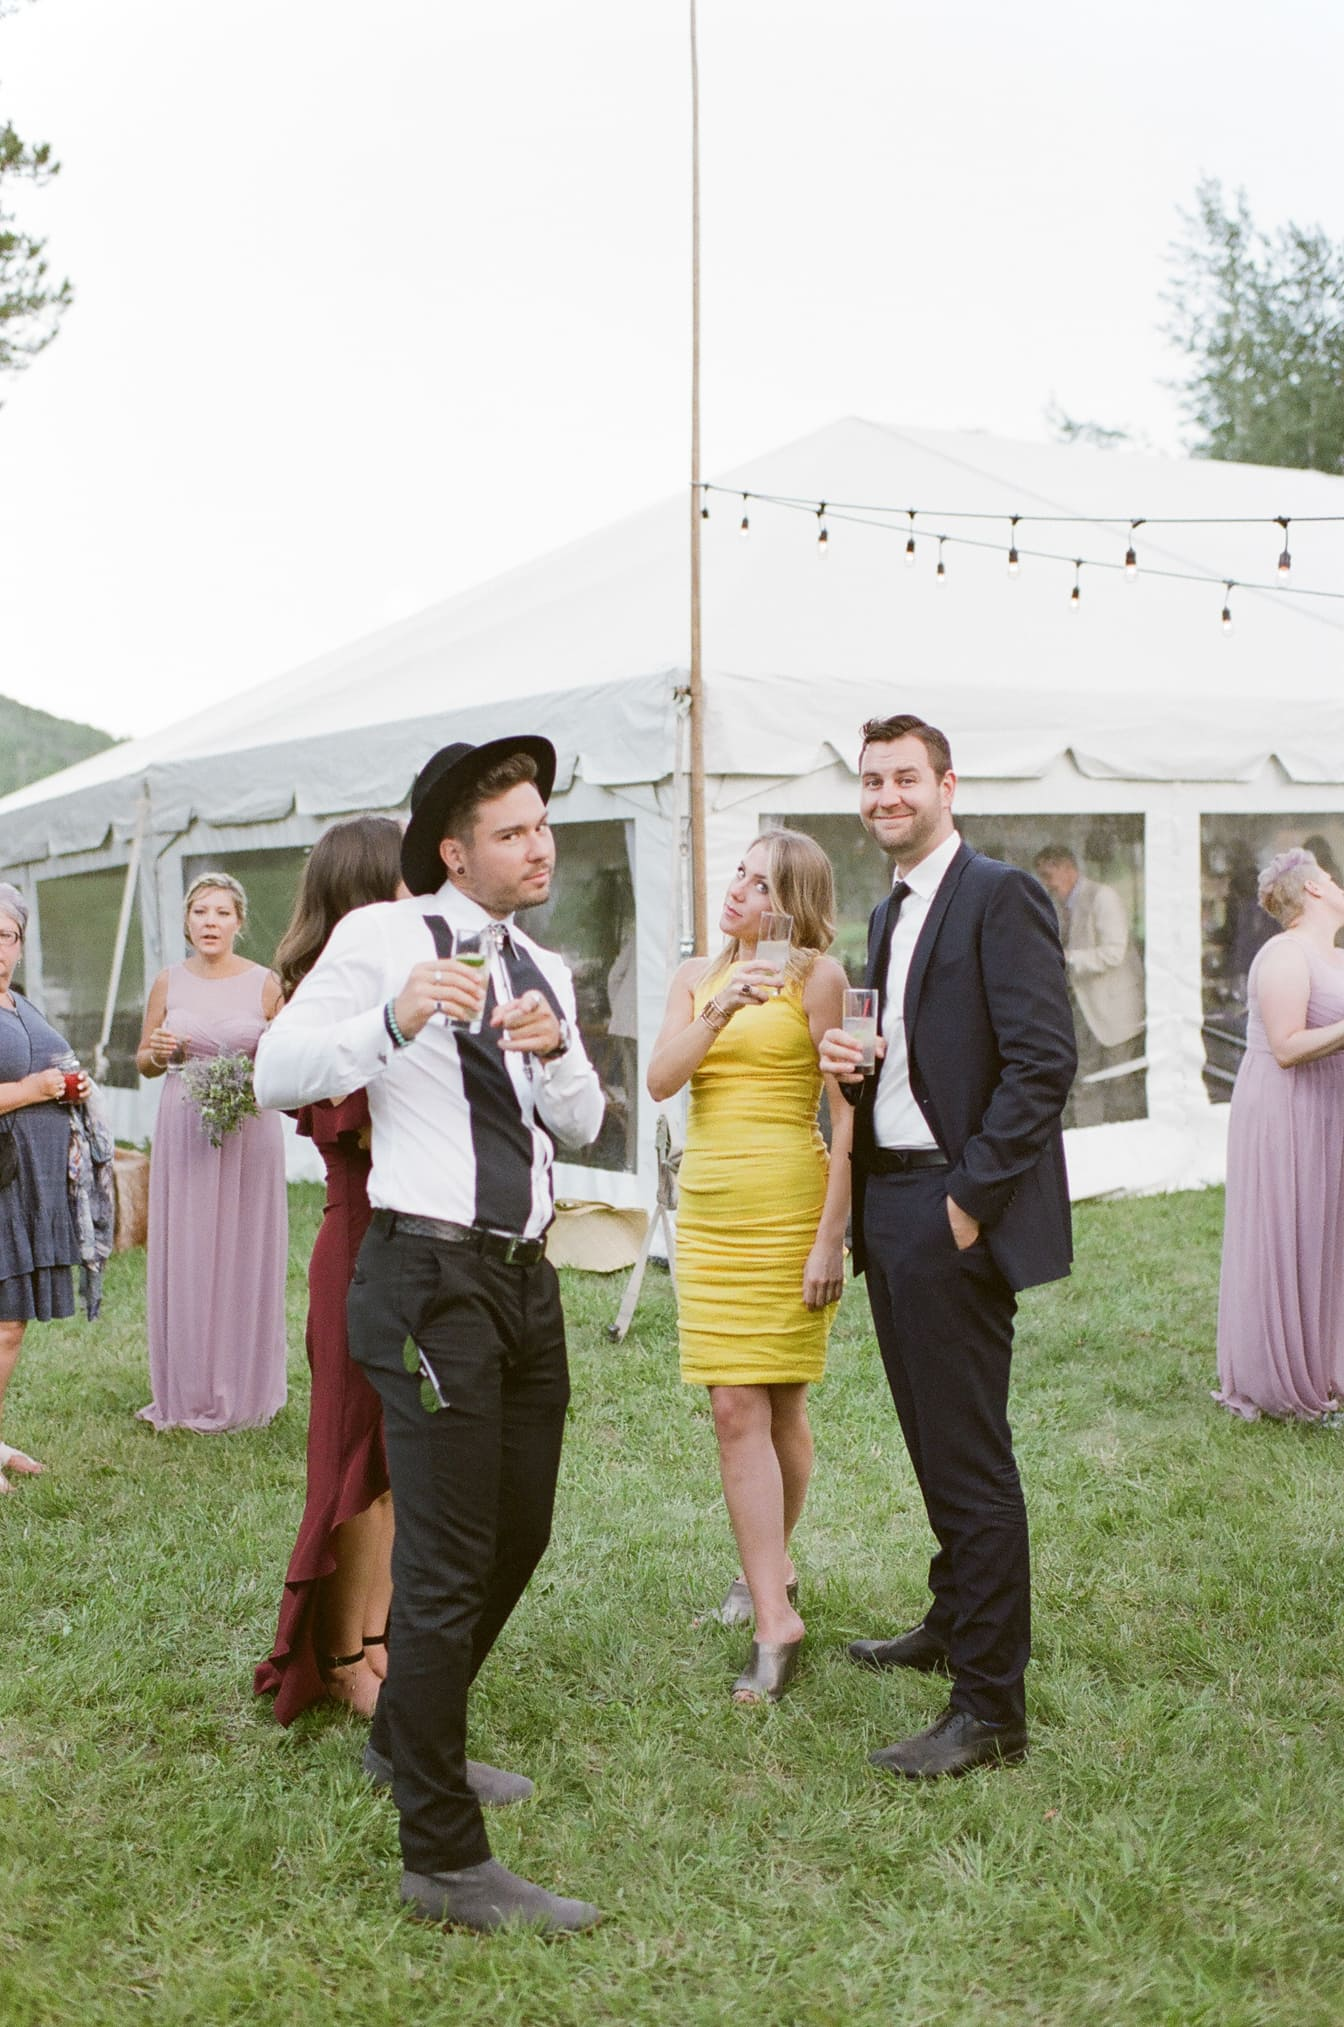 Wedding guests interacting with wedding photographer Tamara Gruner